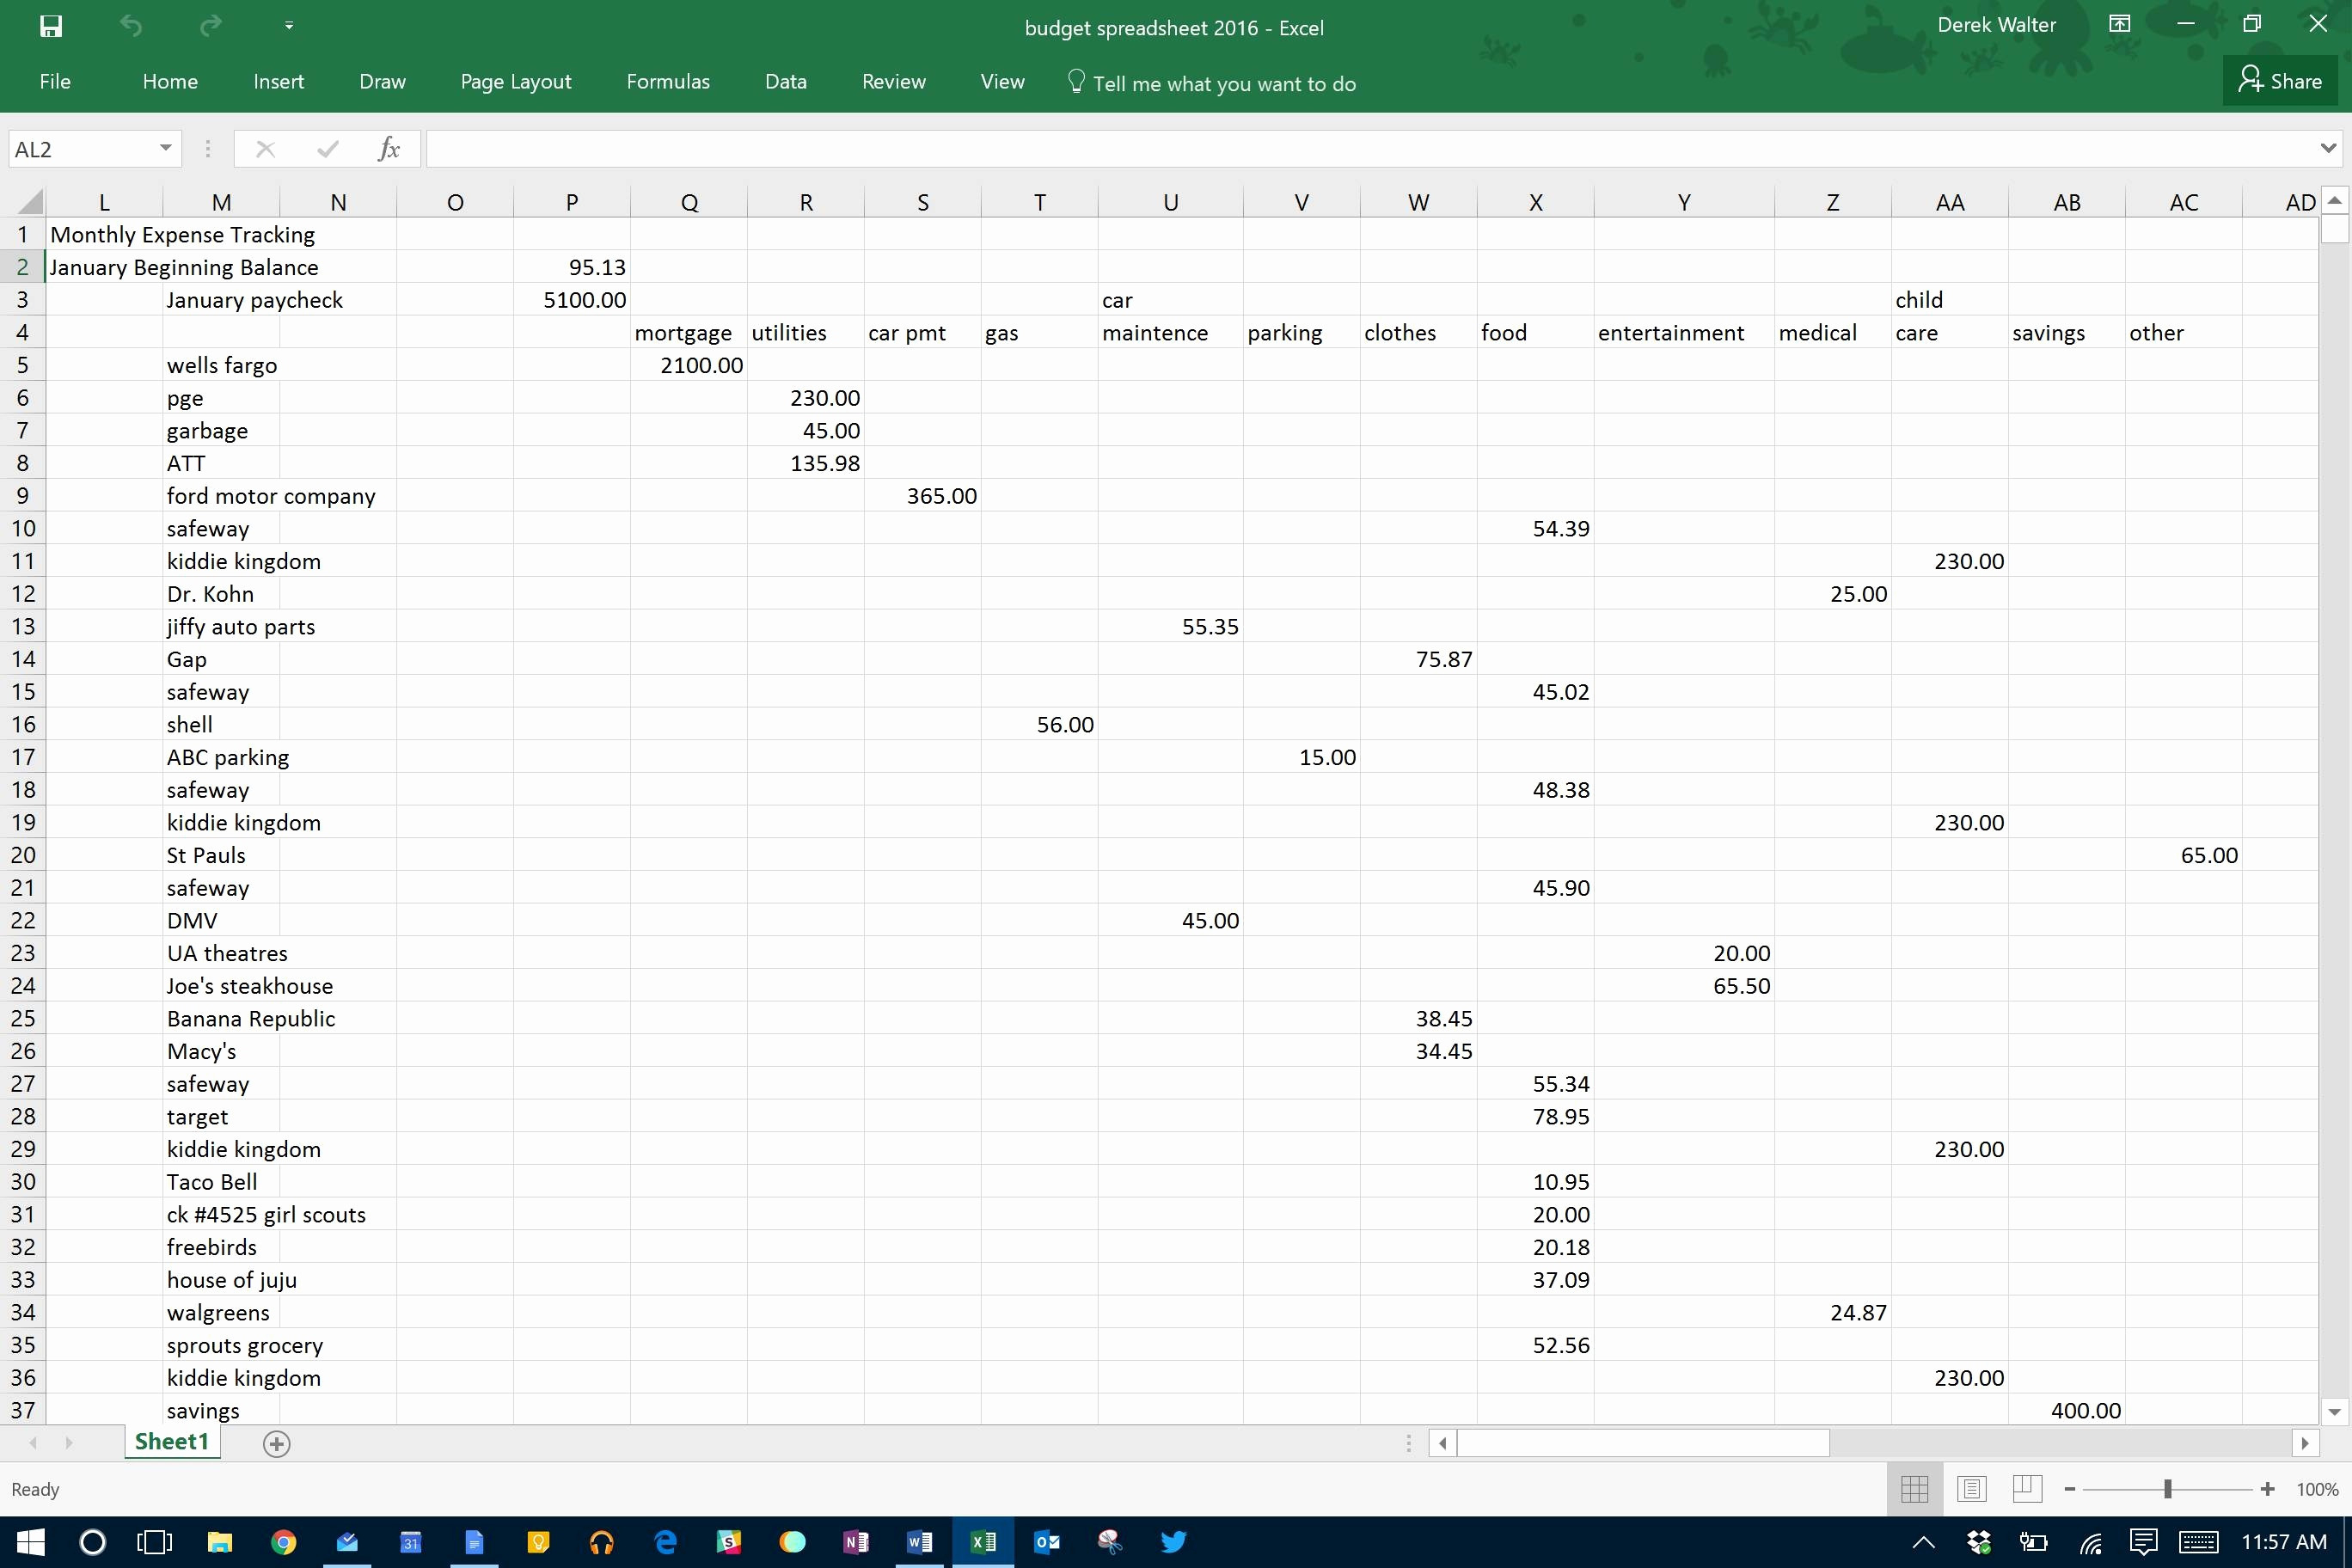 Excel Charitable Donation Spreadsheet Regarding Moving Expenses Spreadsheet Template Elegant Excel Charitable